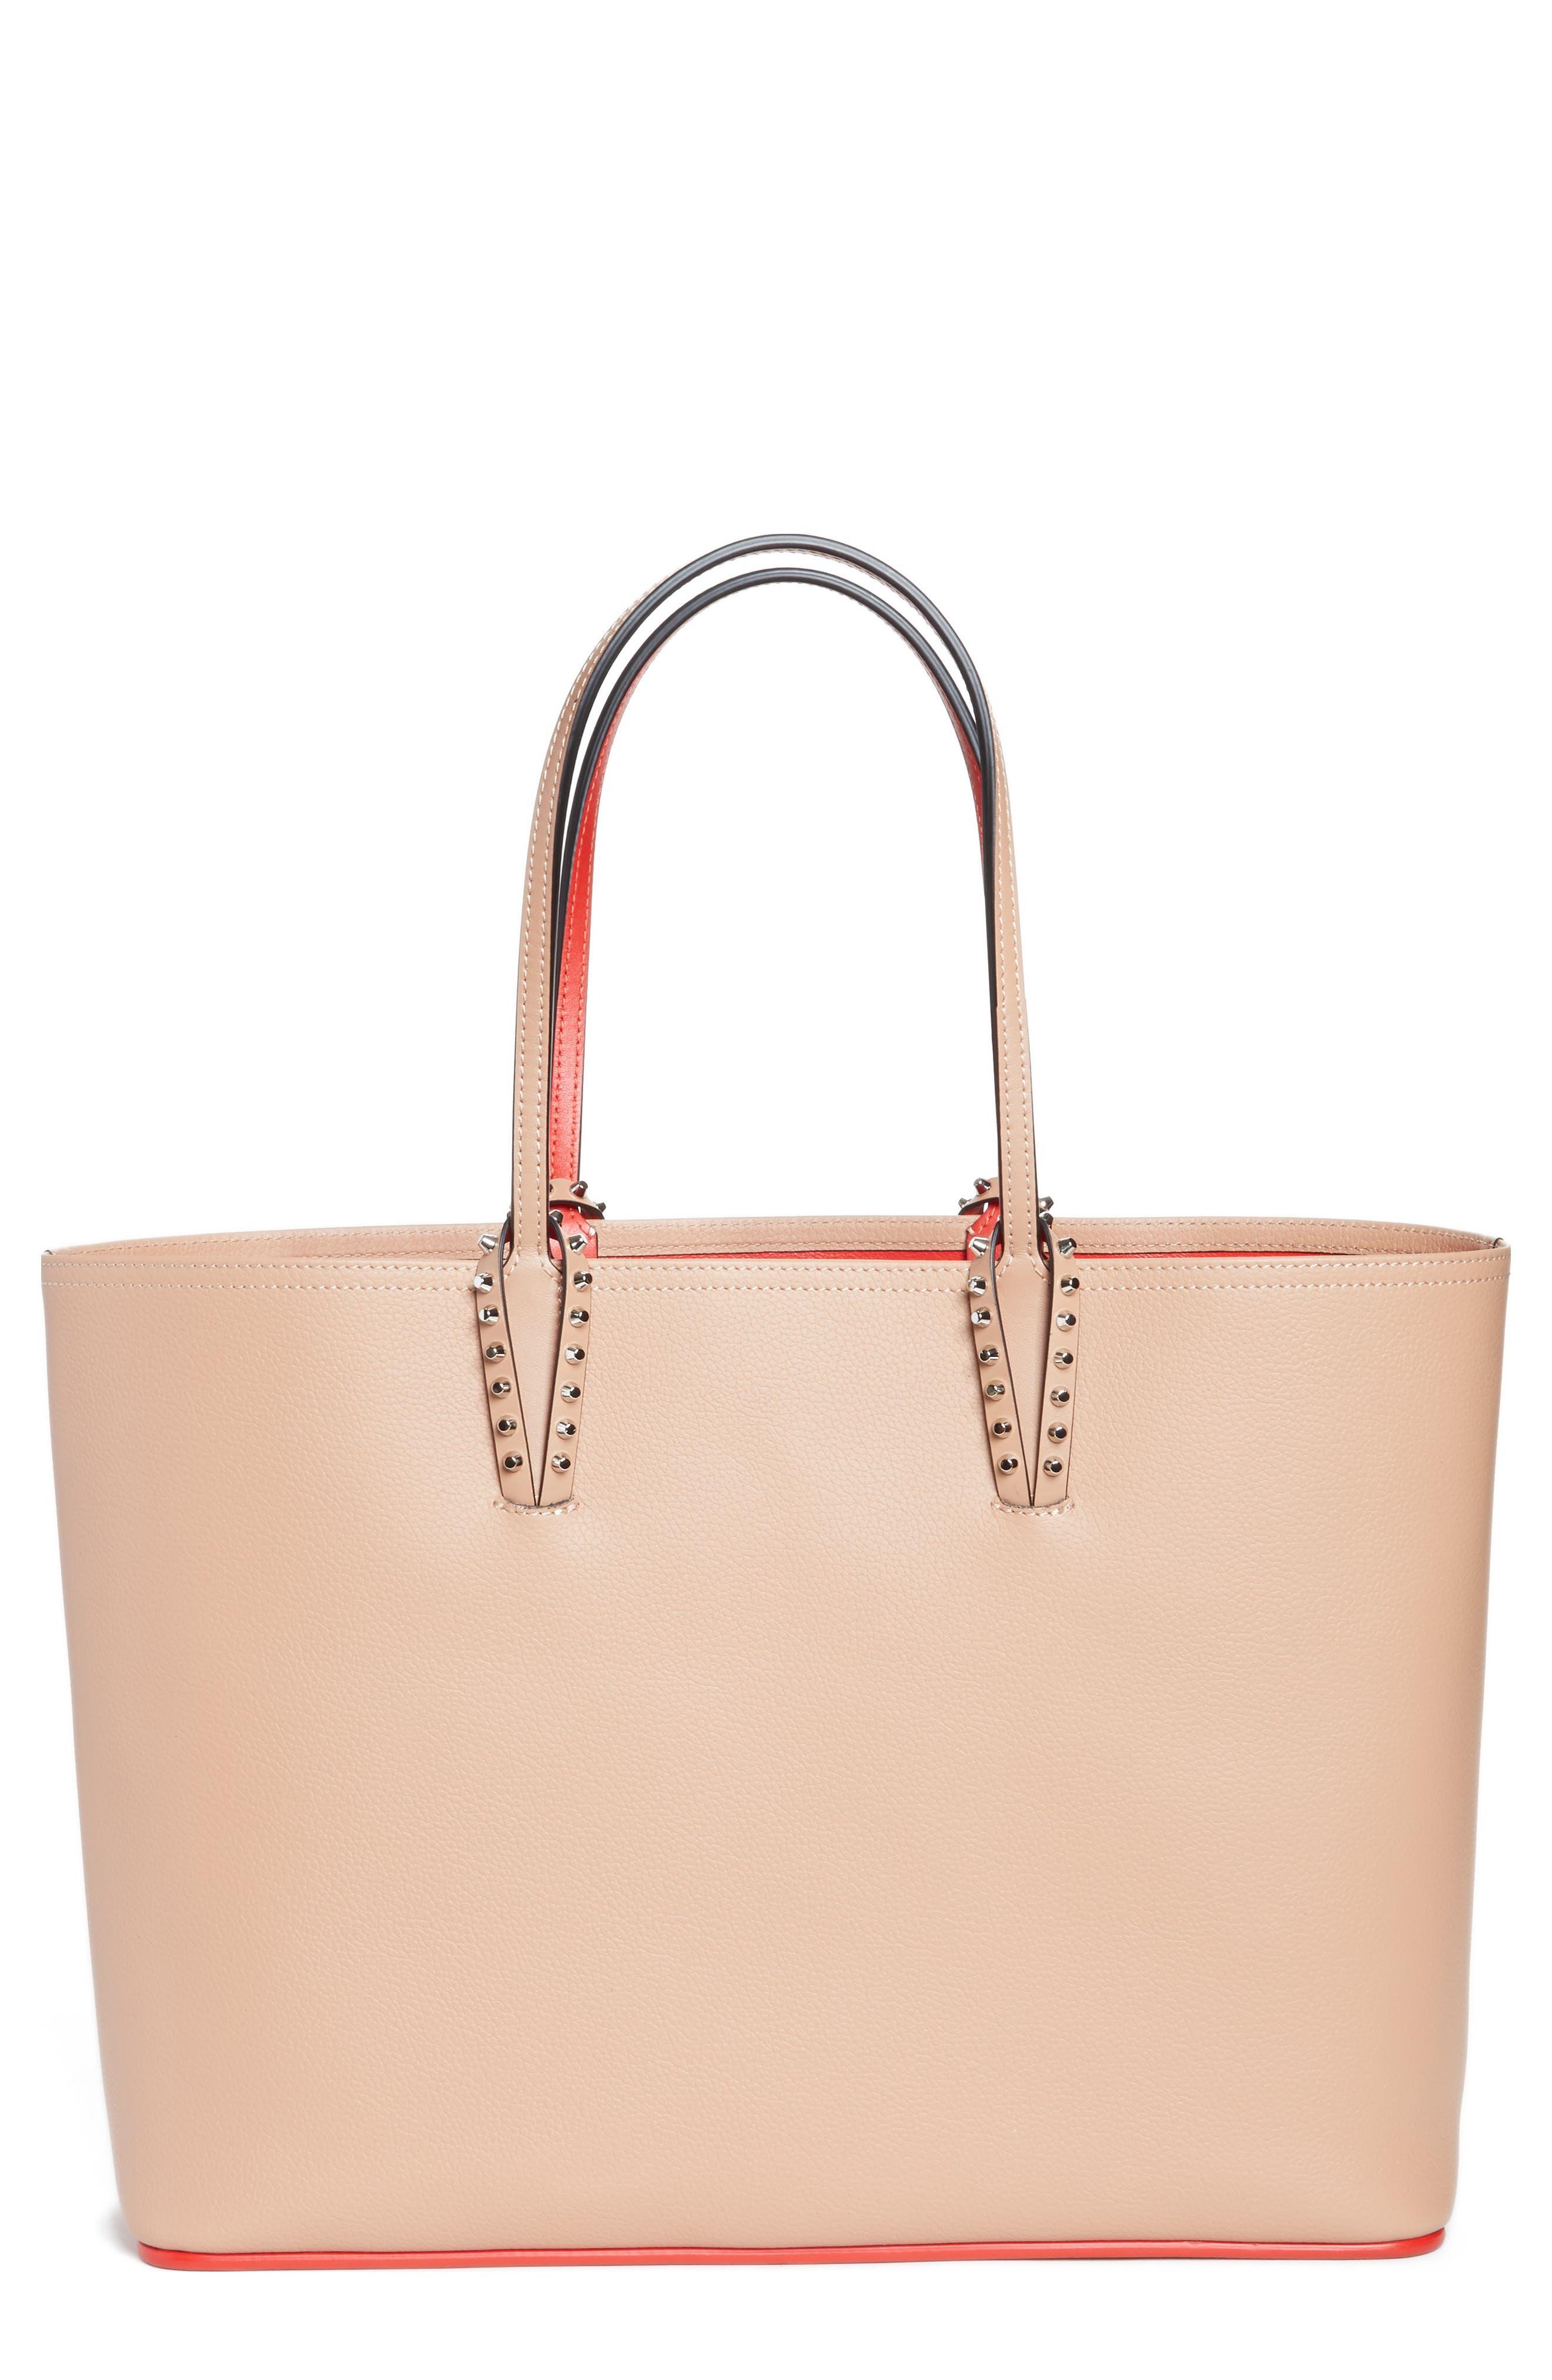 7c6dbac9a7a christian louboutin handbags | Nordstrom